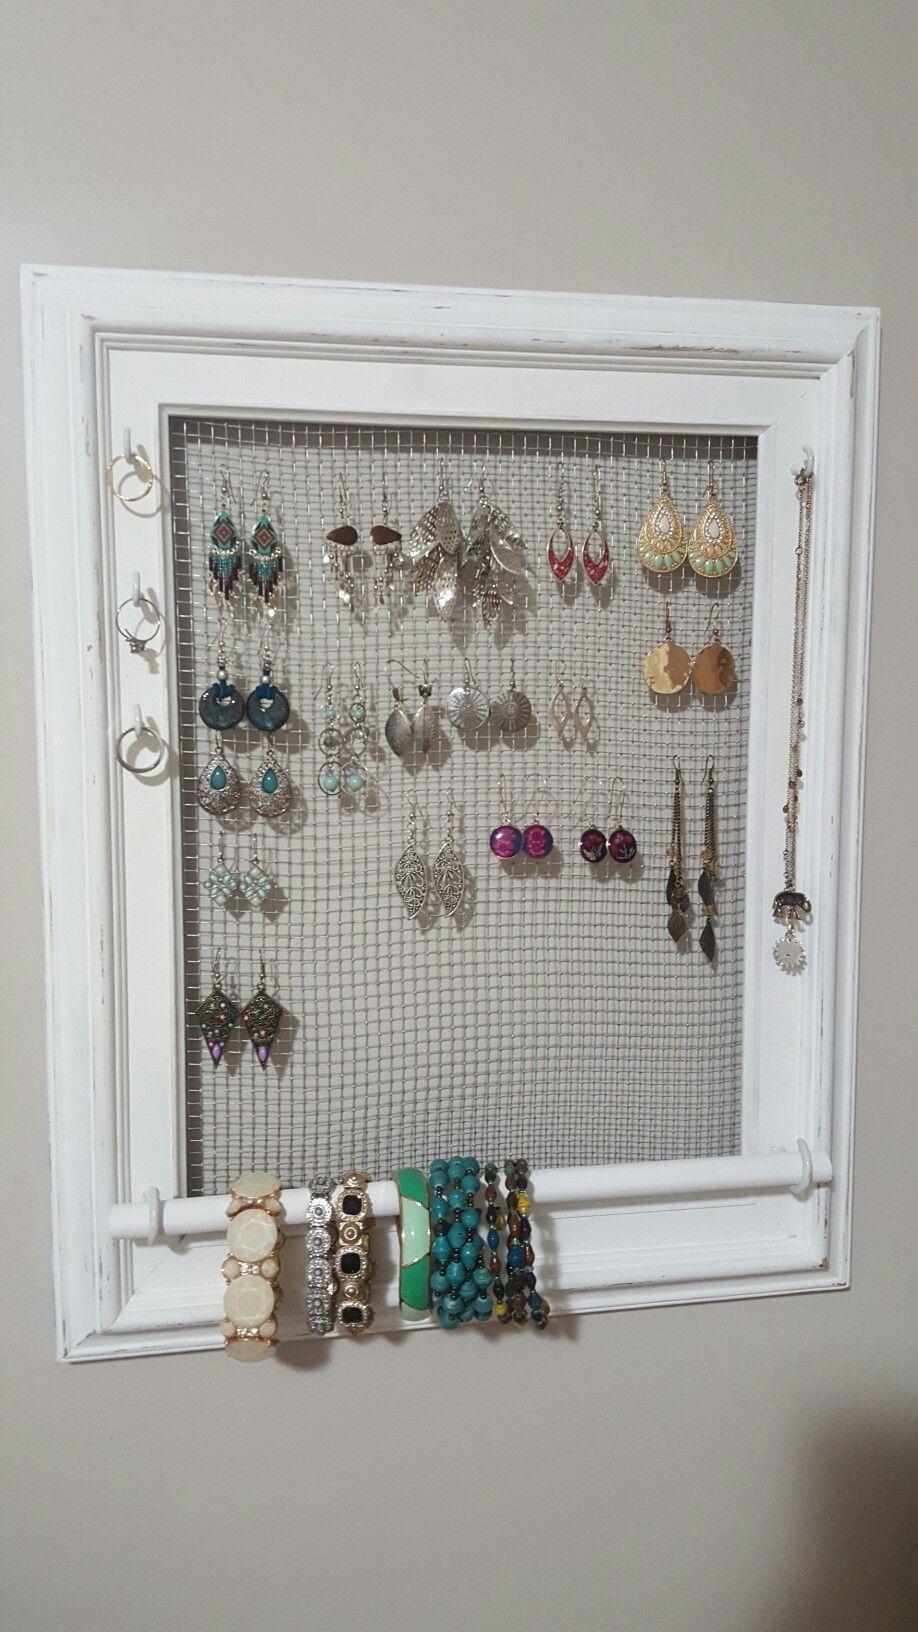 Finally Got Around To Making My Own Jewellery Organizer Thanks To